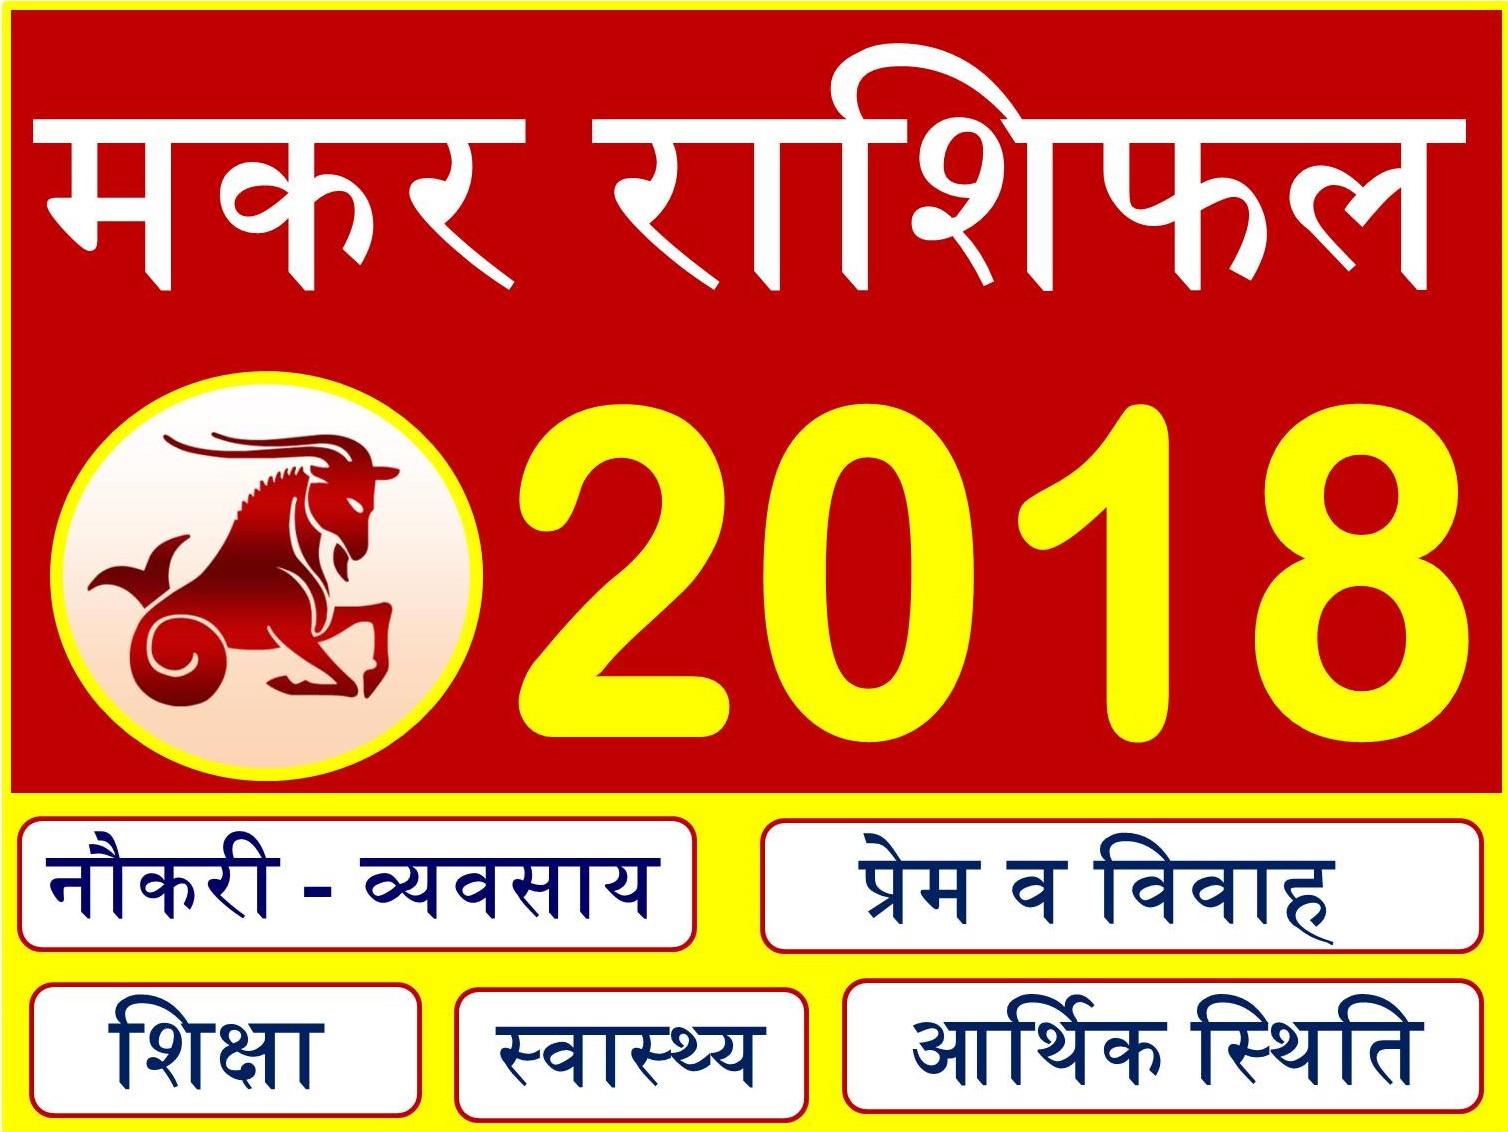 2018 Capricorn 2018 Horoscope